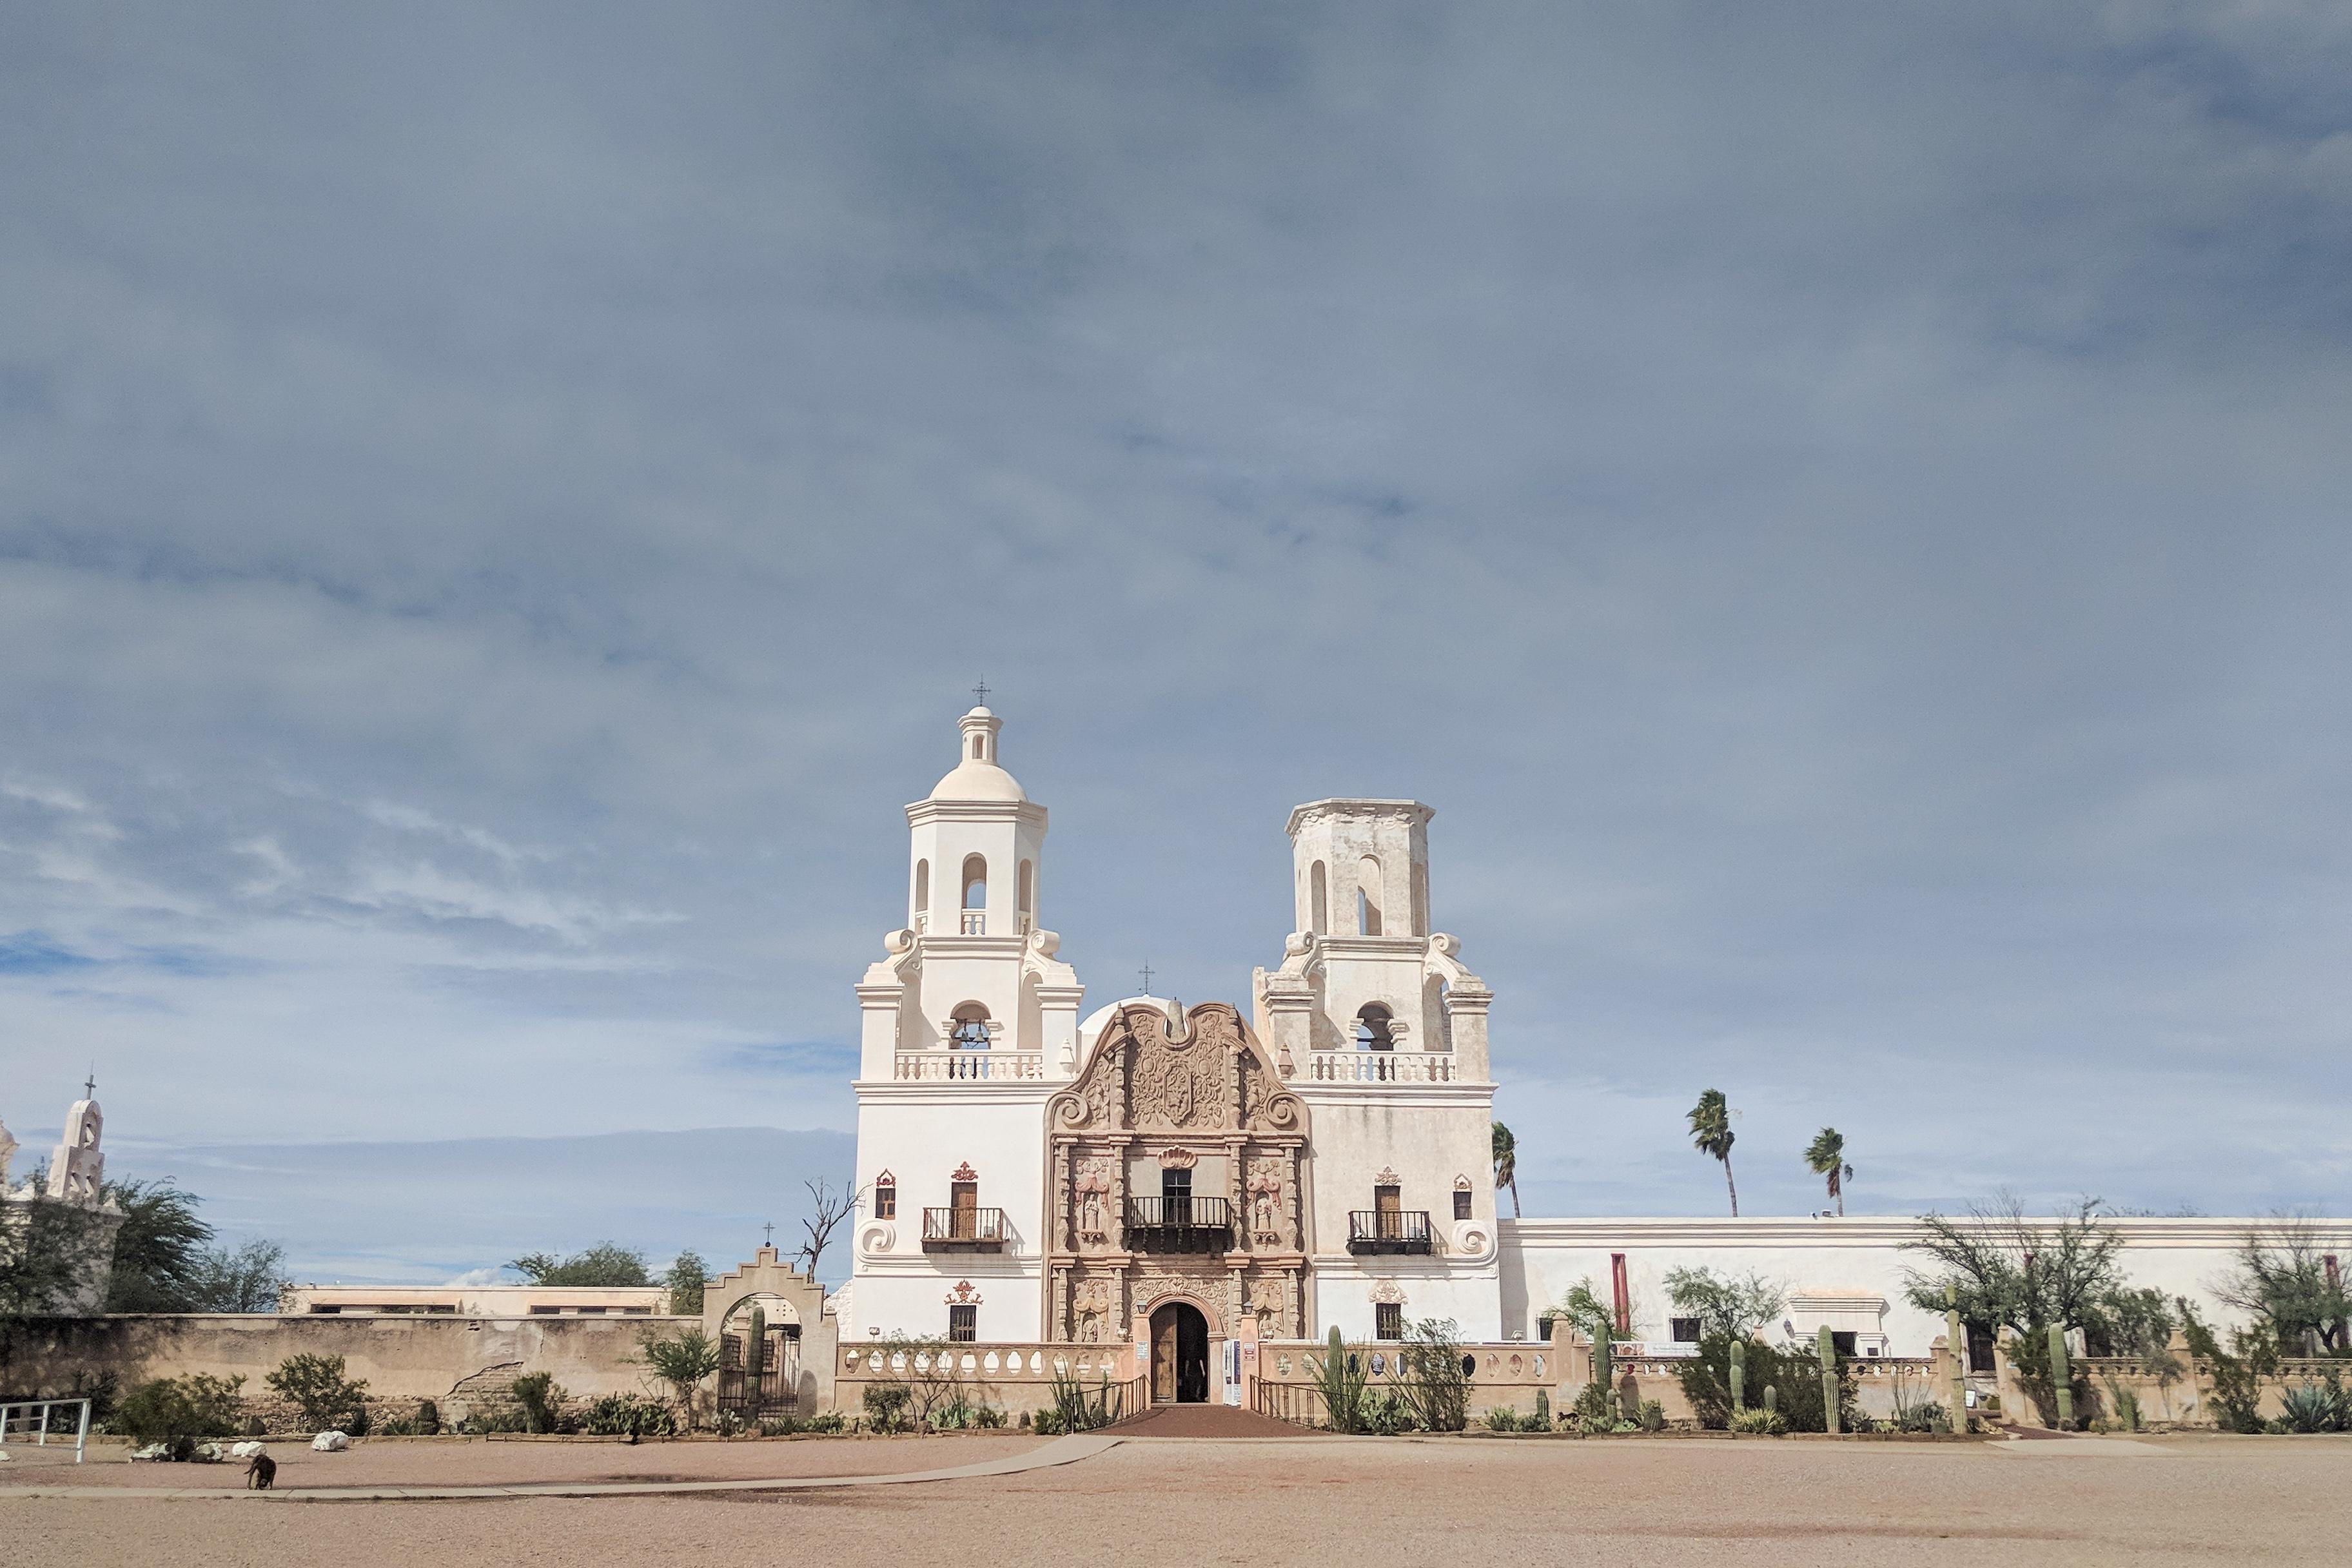 San Xavier Mission/ Tucson AZ